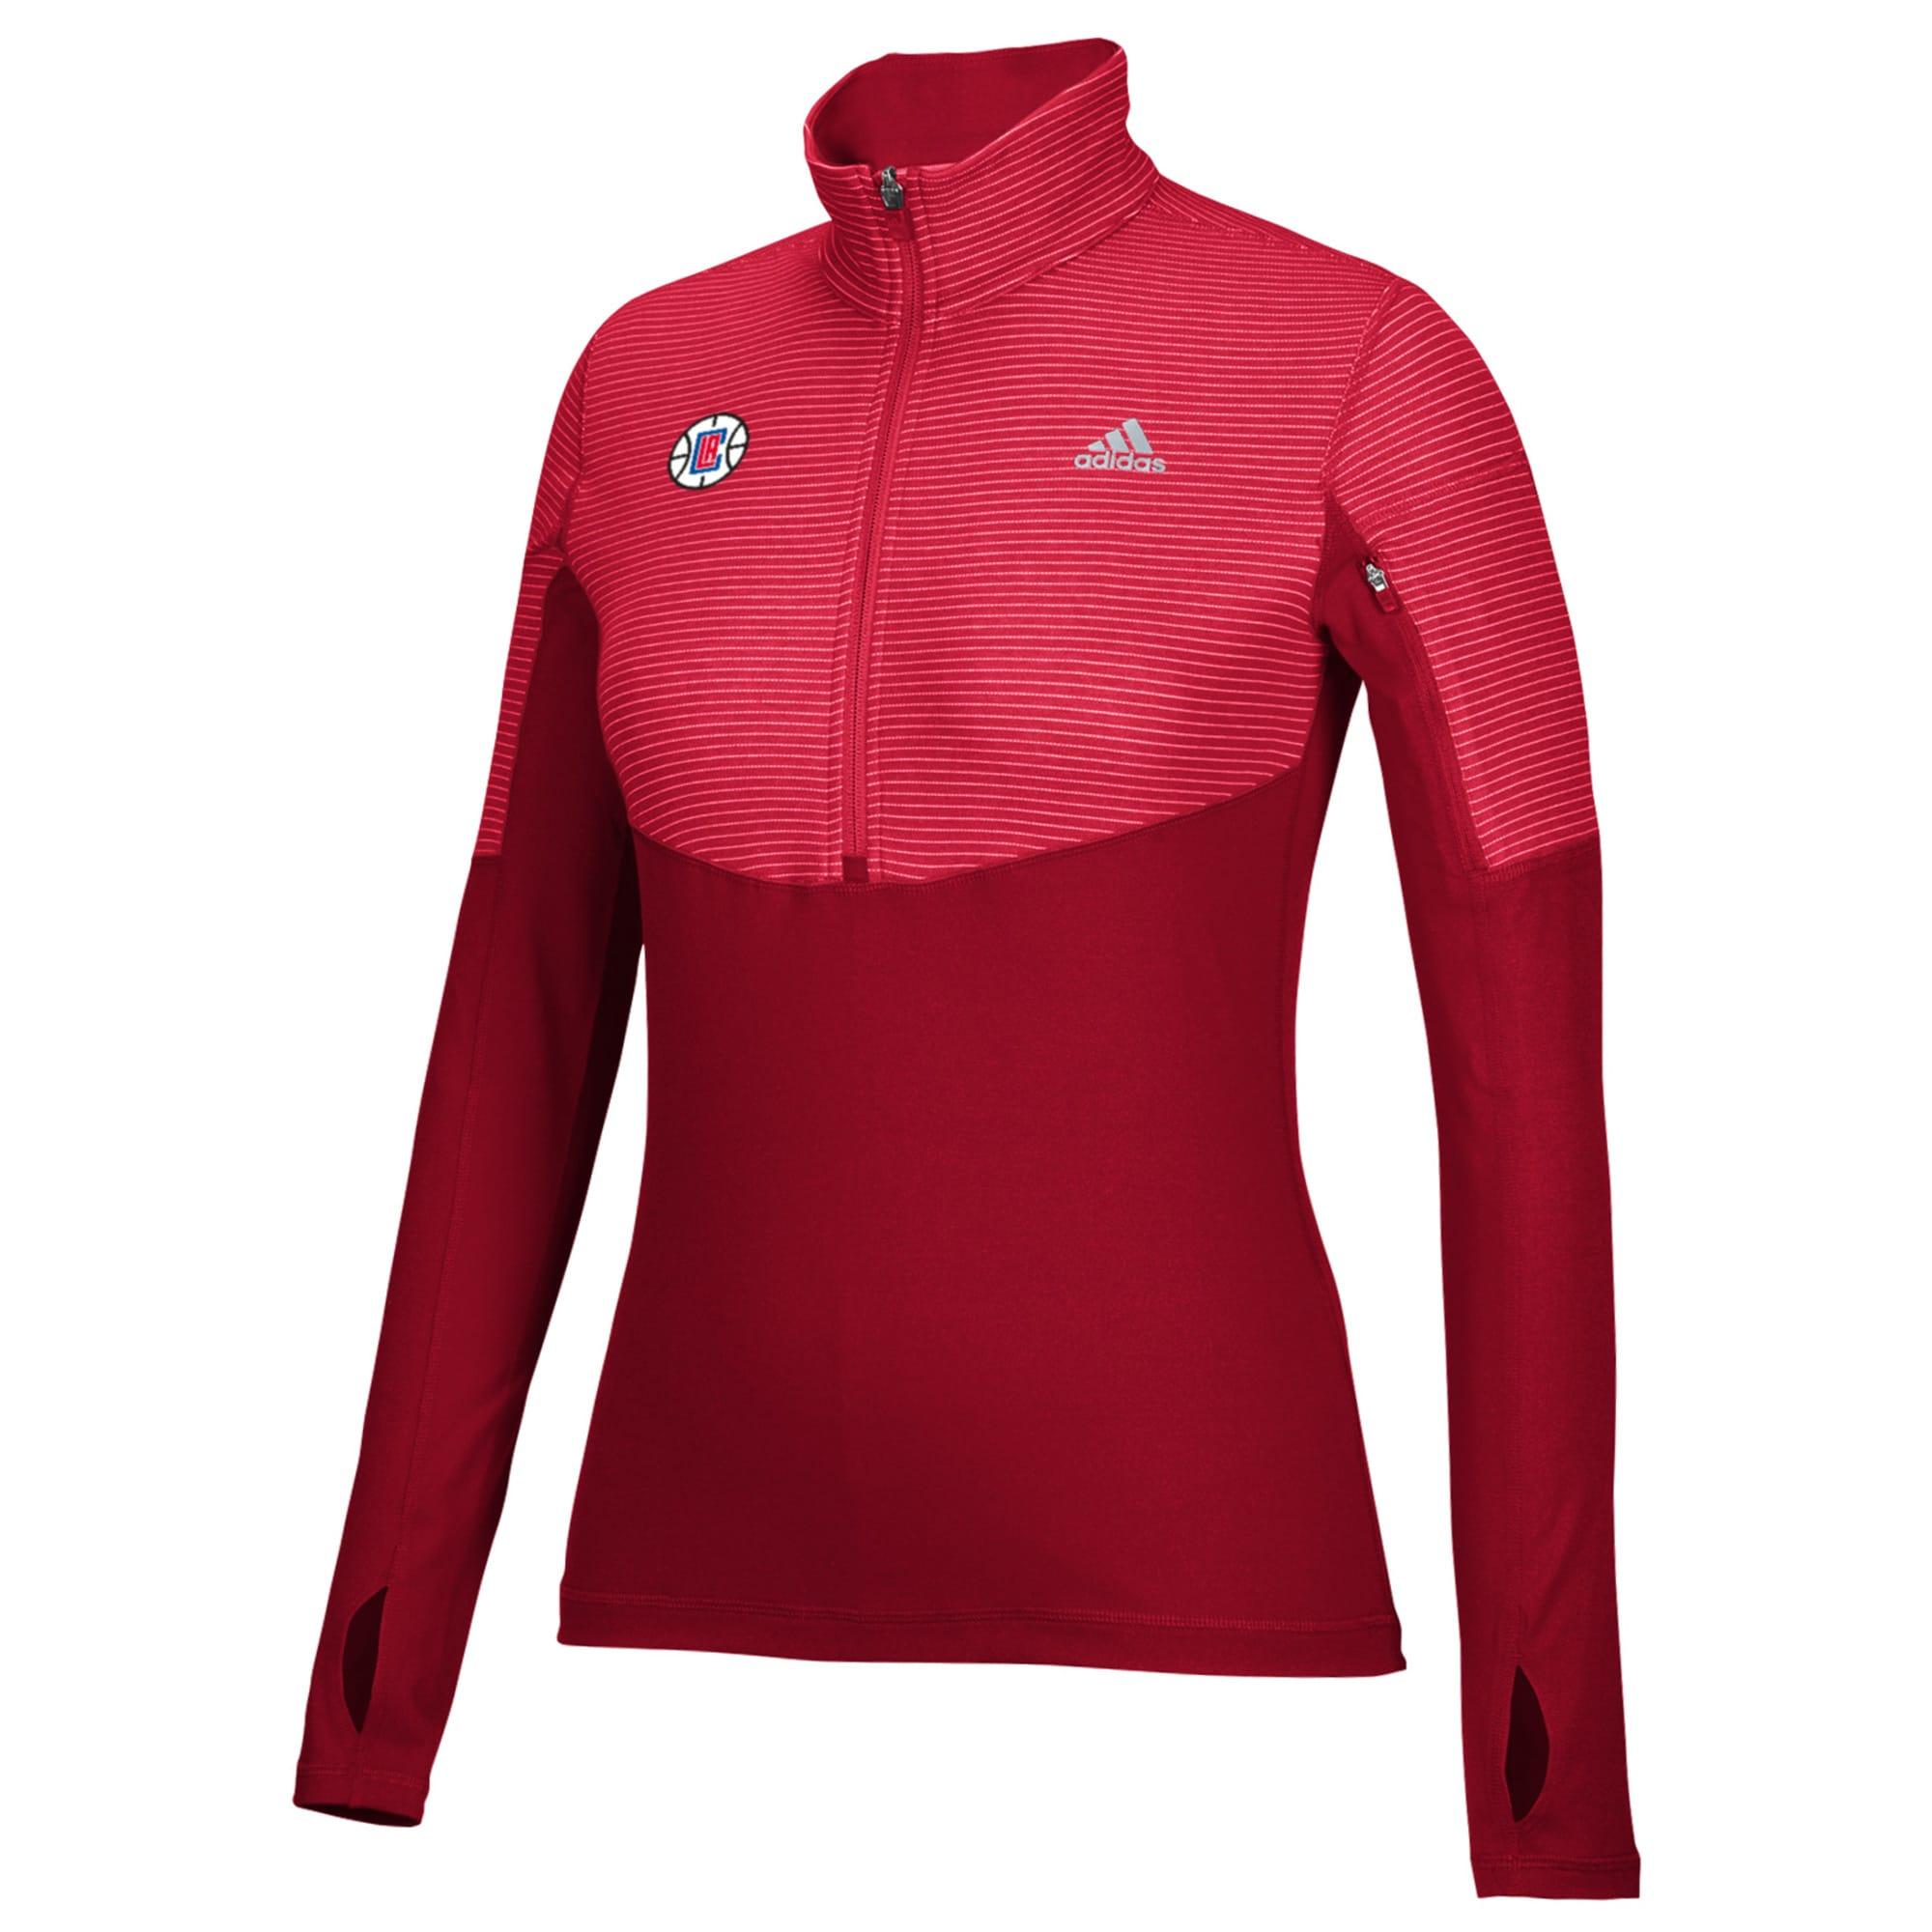 LA Clippers adidas Women's Team Logo Lightweight Performance Half-Zip Jacket - Red